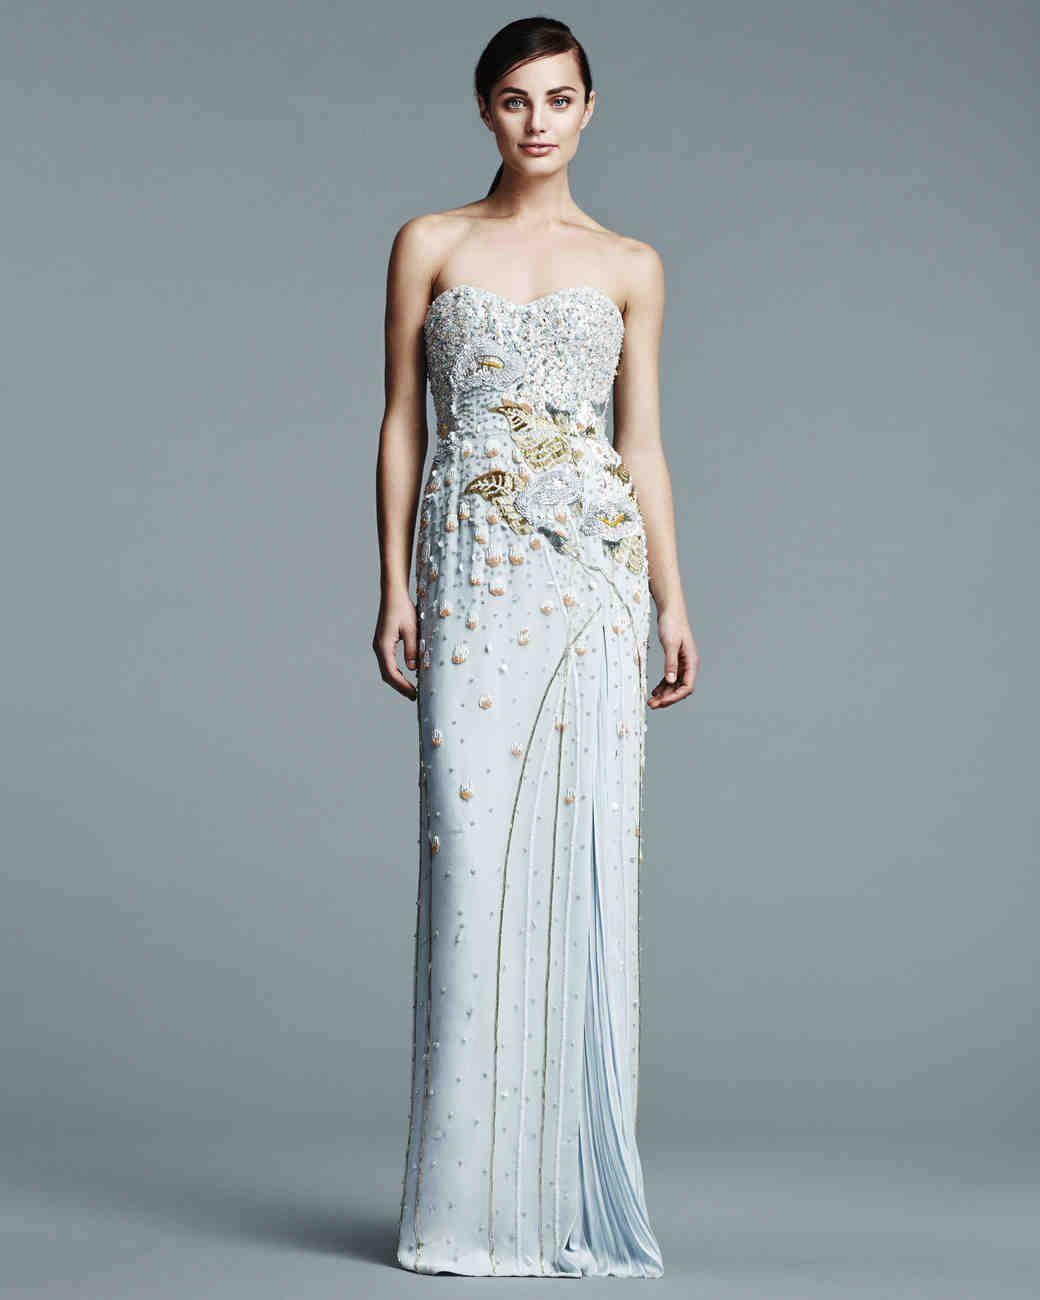 The 9 Best Wedding Dress Trends from Bridal Fashion Week | Wedding ...